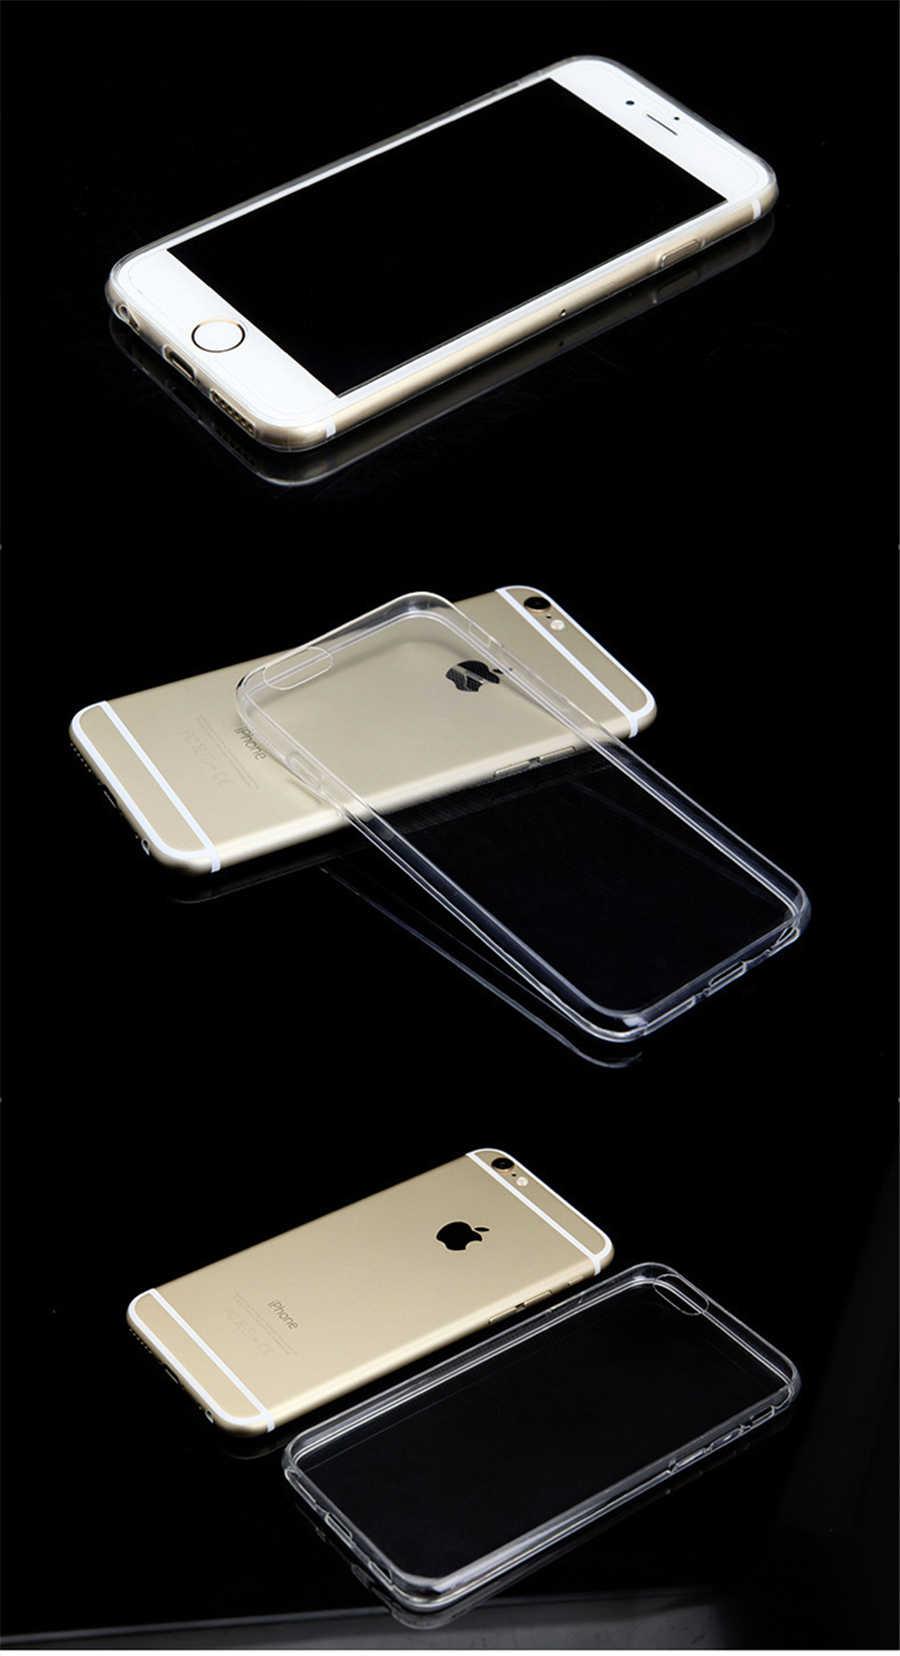 2018 Fashion Atasan Baru Transparan Lembut TPU Silicone Sangat Tipis Penutup Ponsel untuk iPhone 8 7 5 5 S SE 6 6 S Plus X S R Max